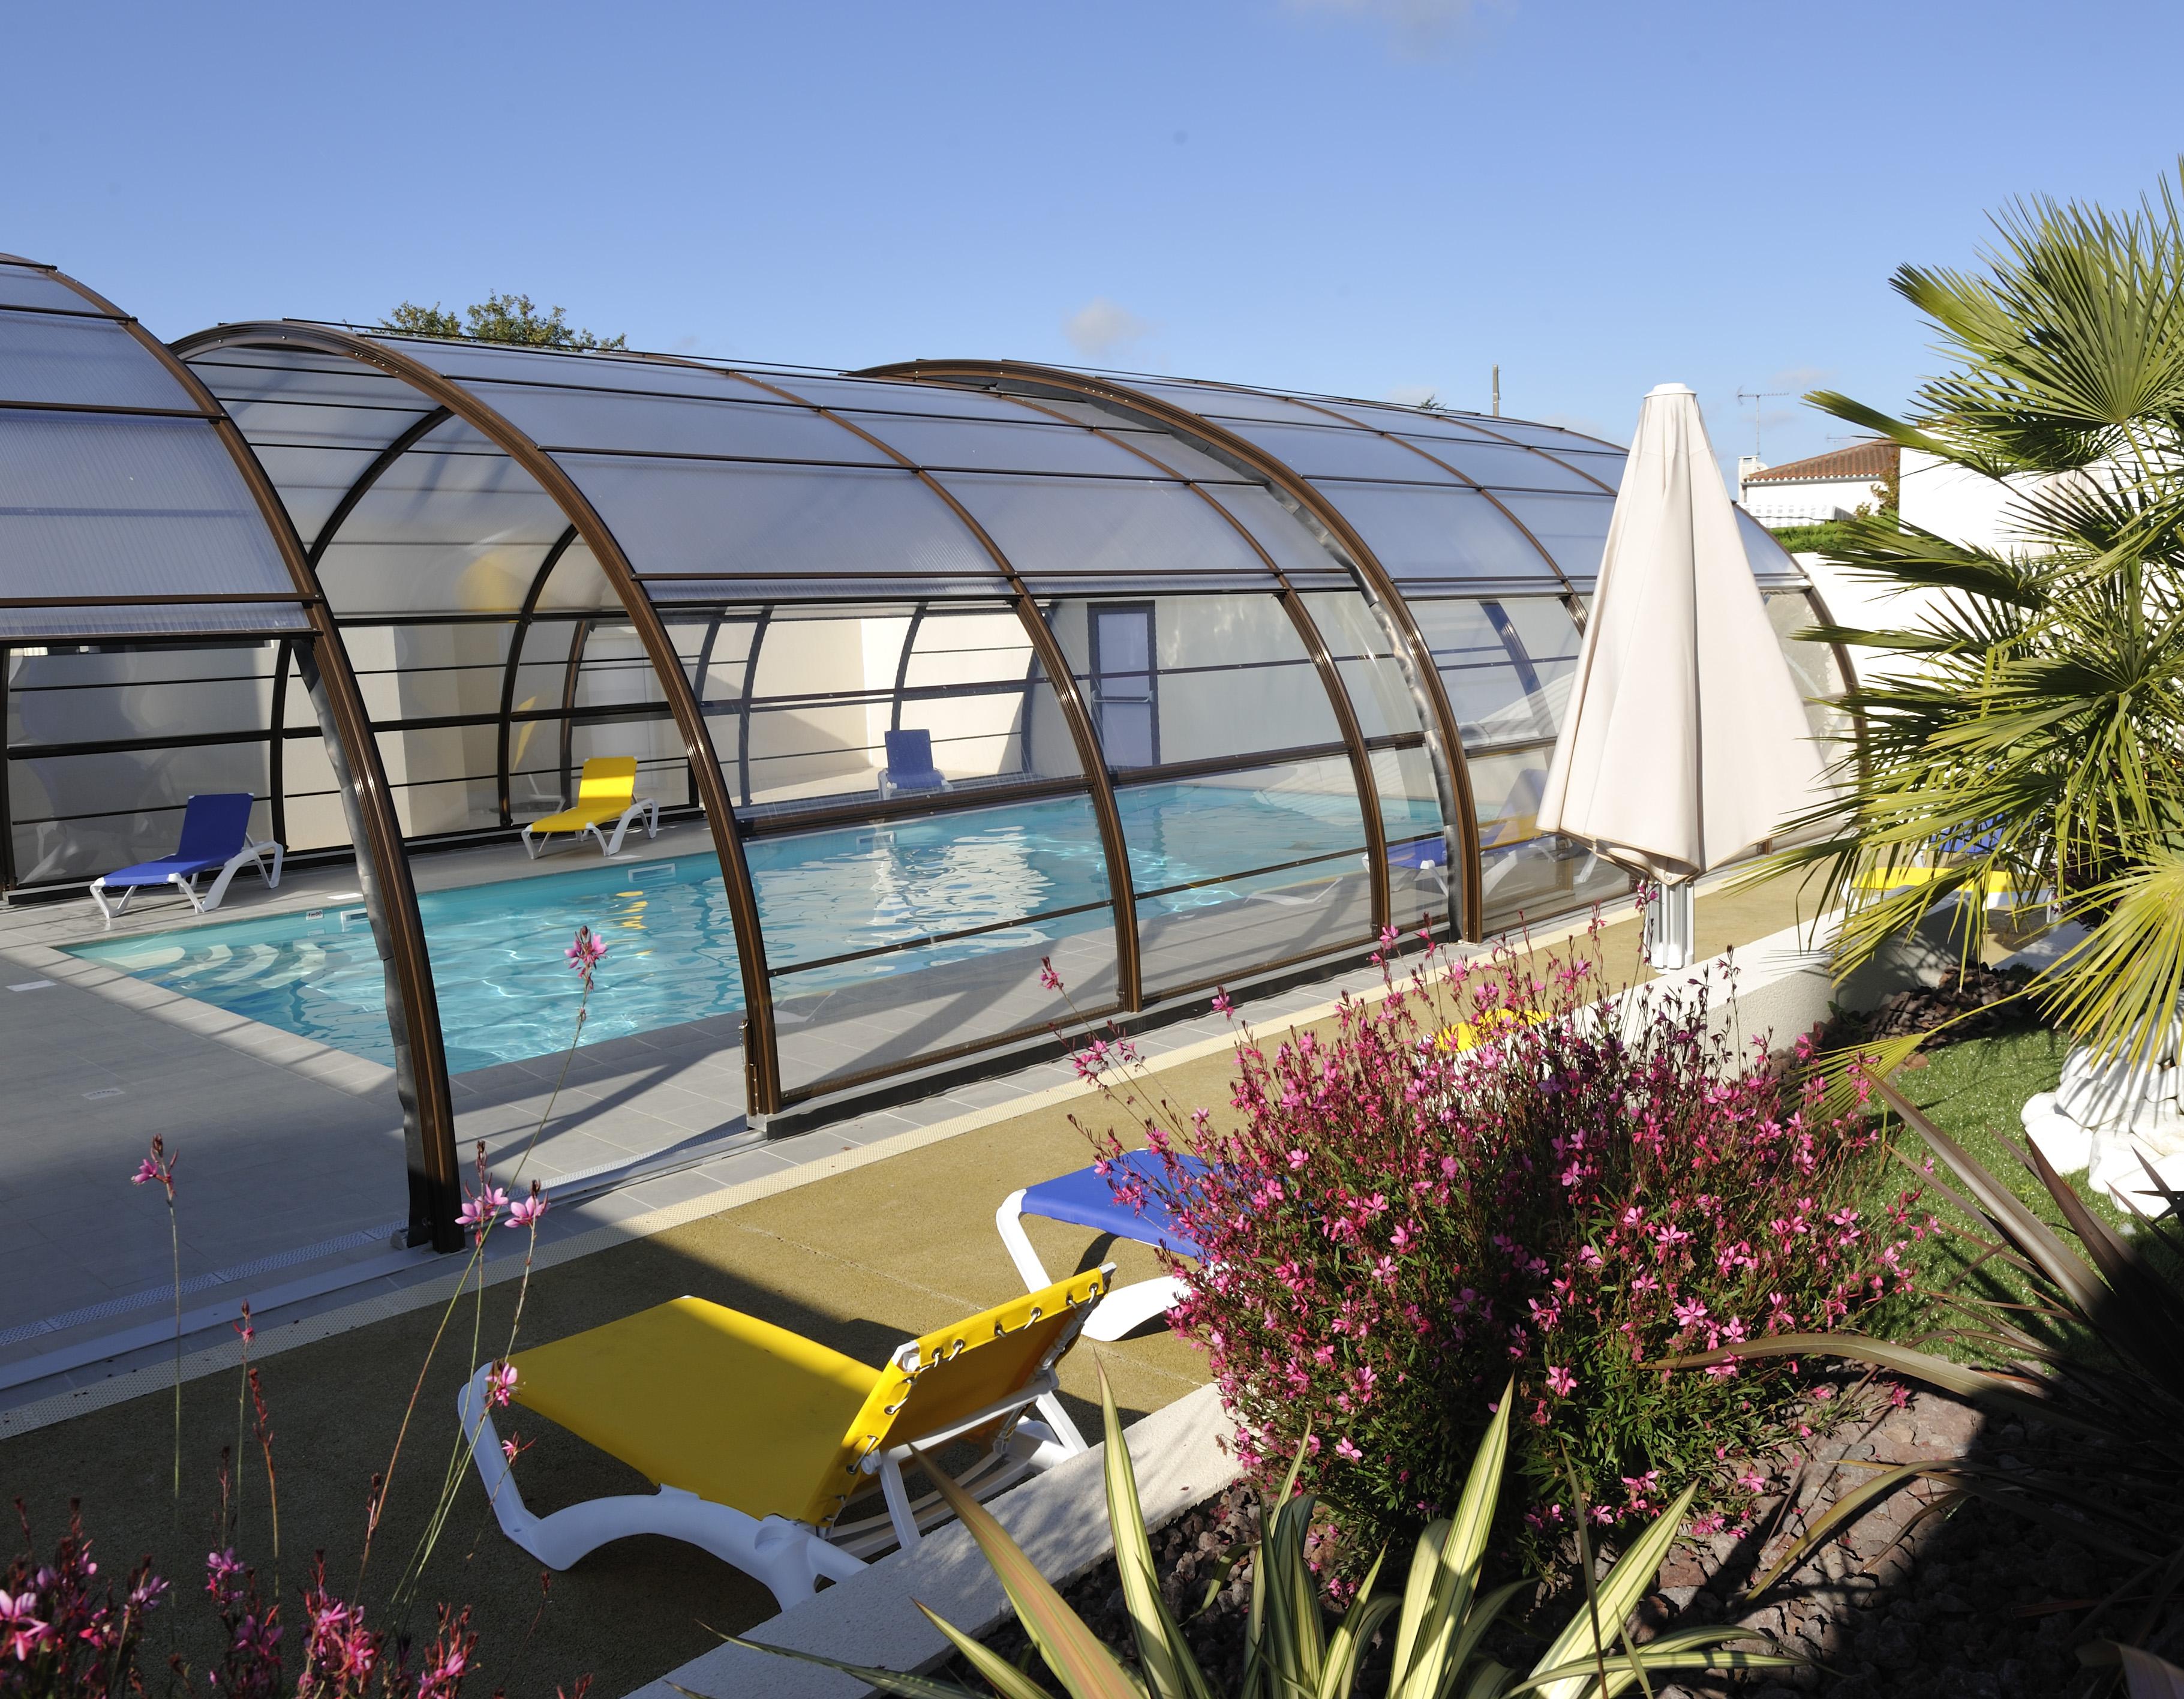 Camping avec piscine couverte et chauff e br tignolles sur mer - Camping avec piscine couverte chauffee ...